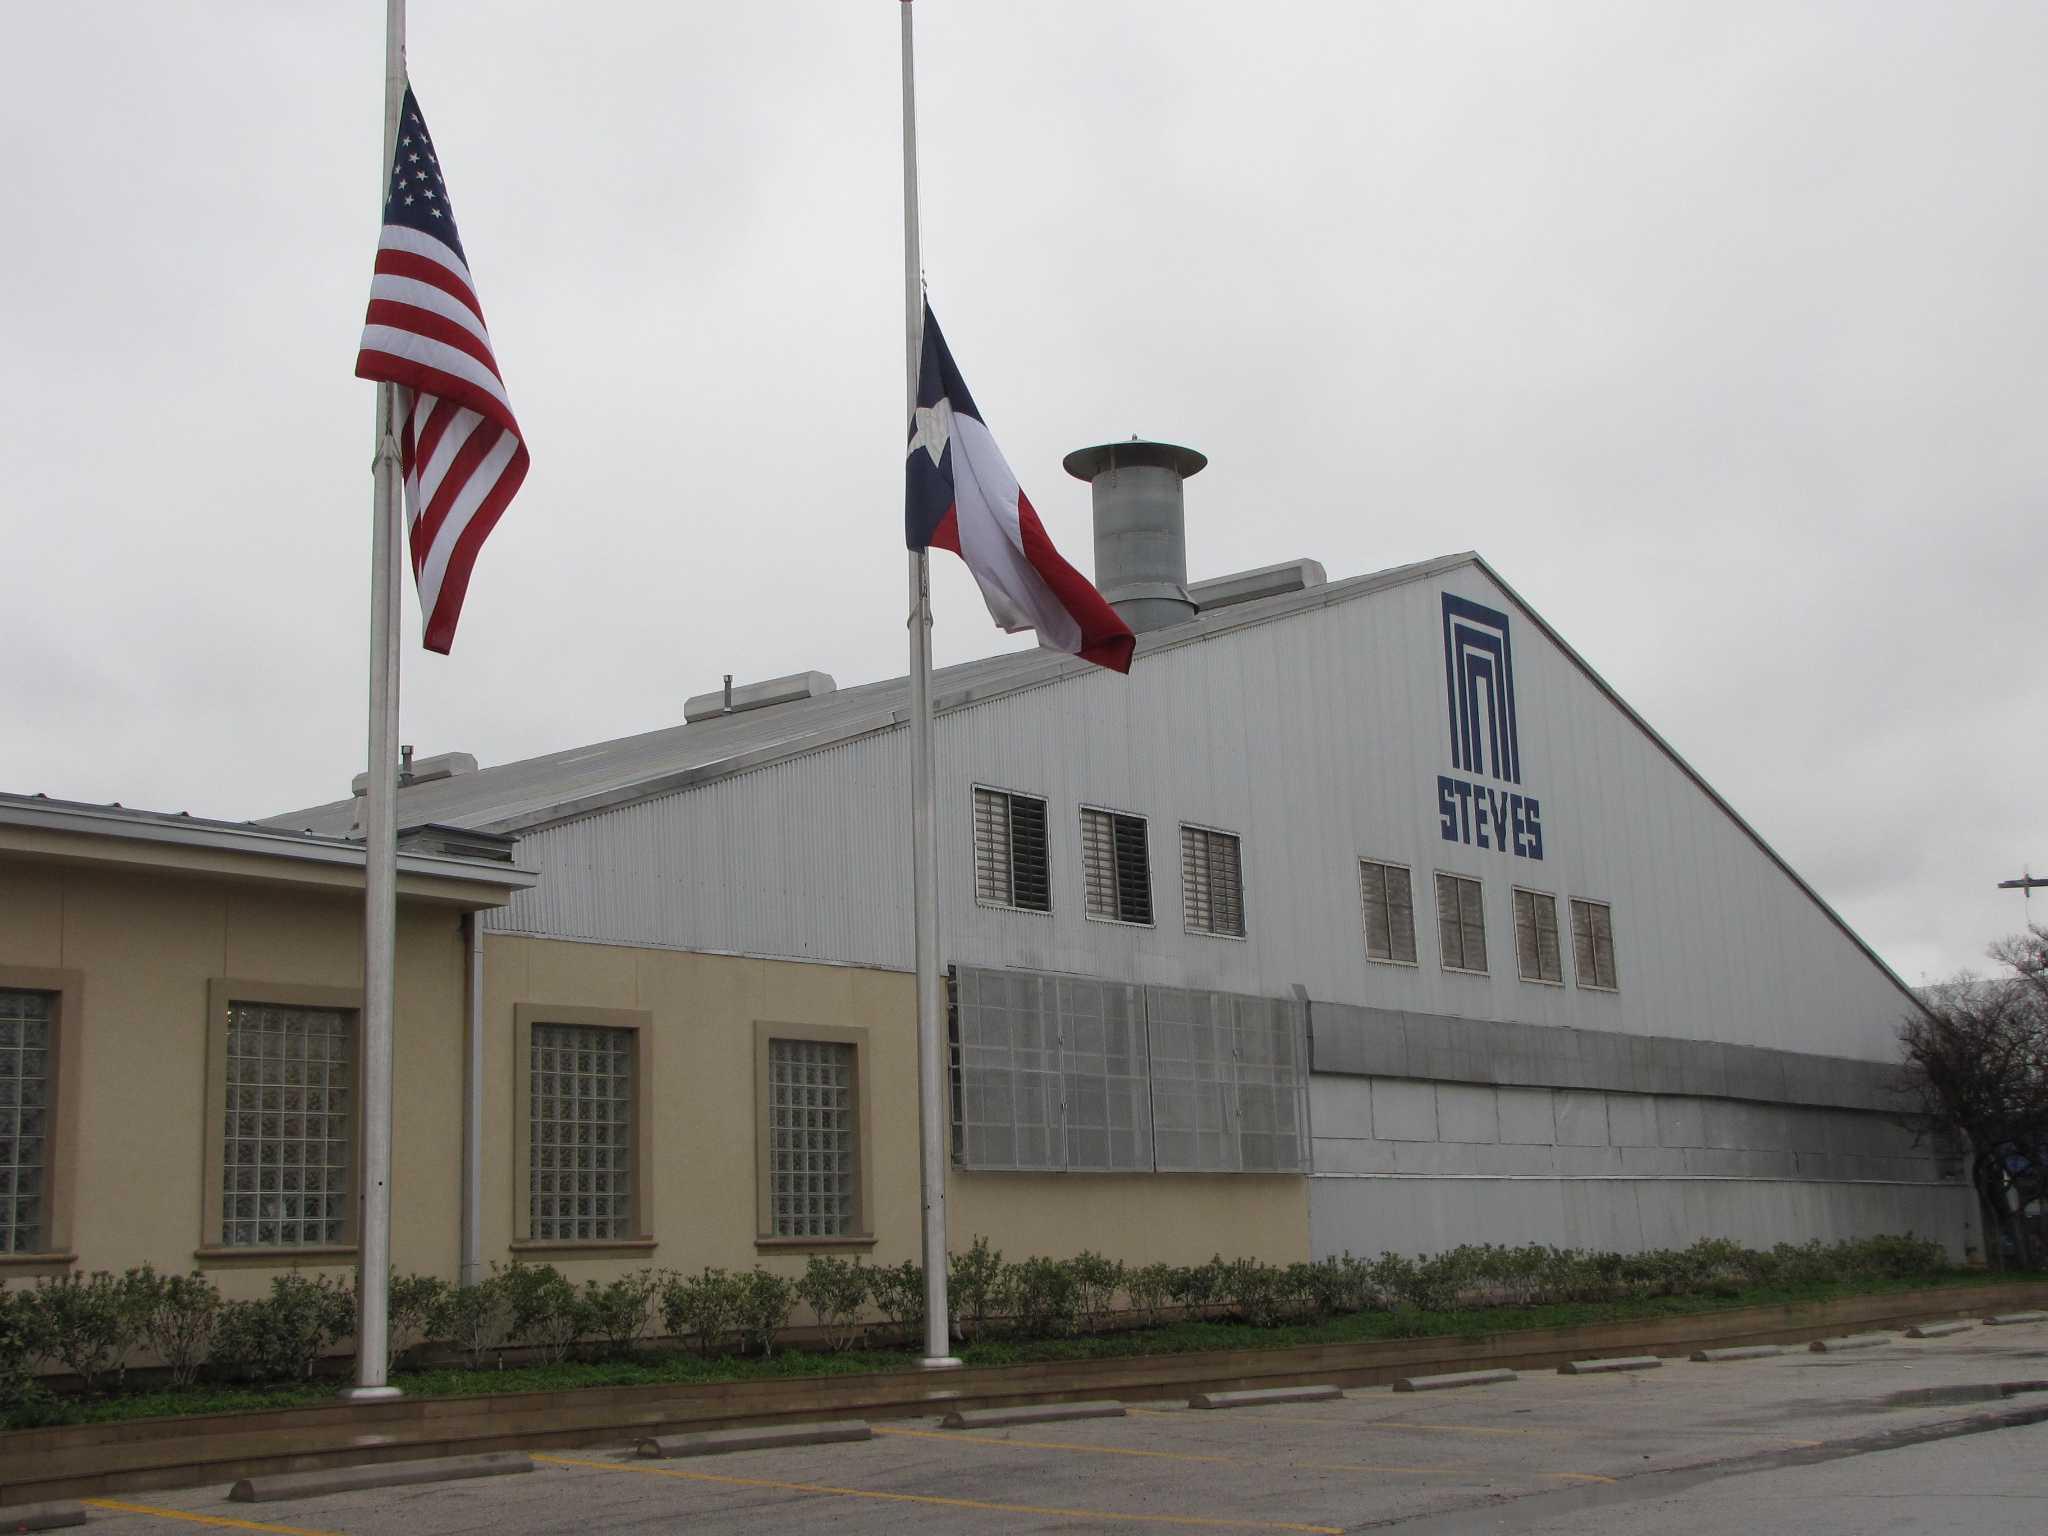 San Antonio door maker wins major antitrust case - San